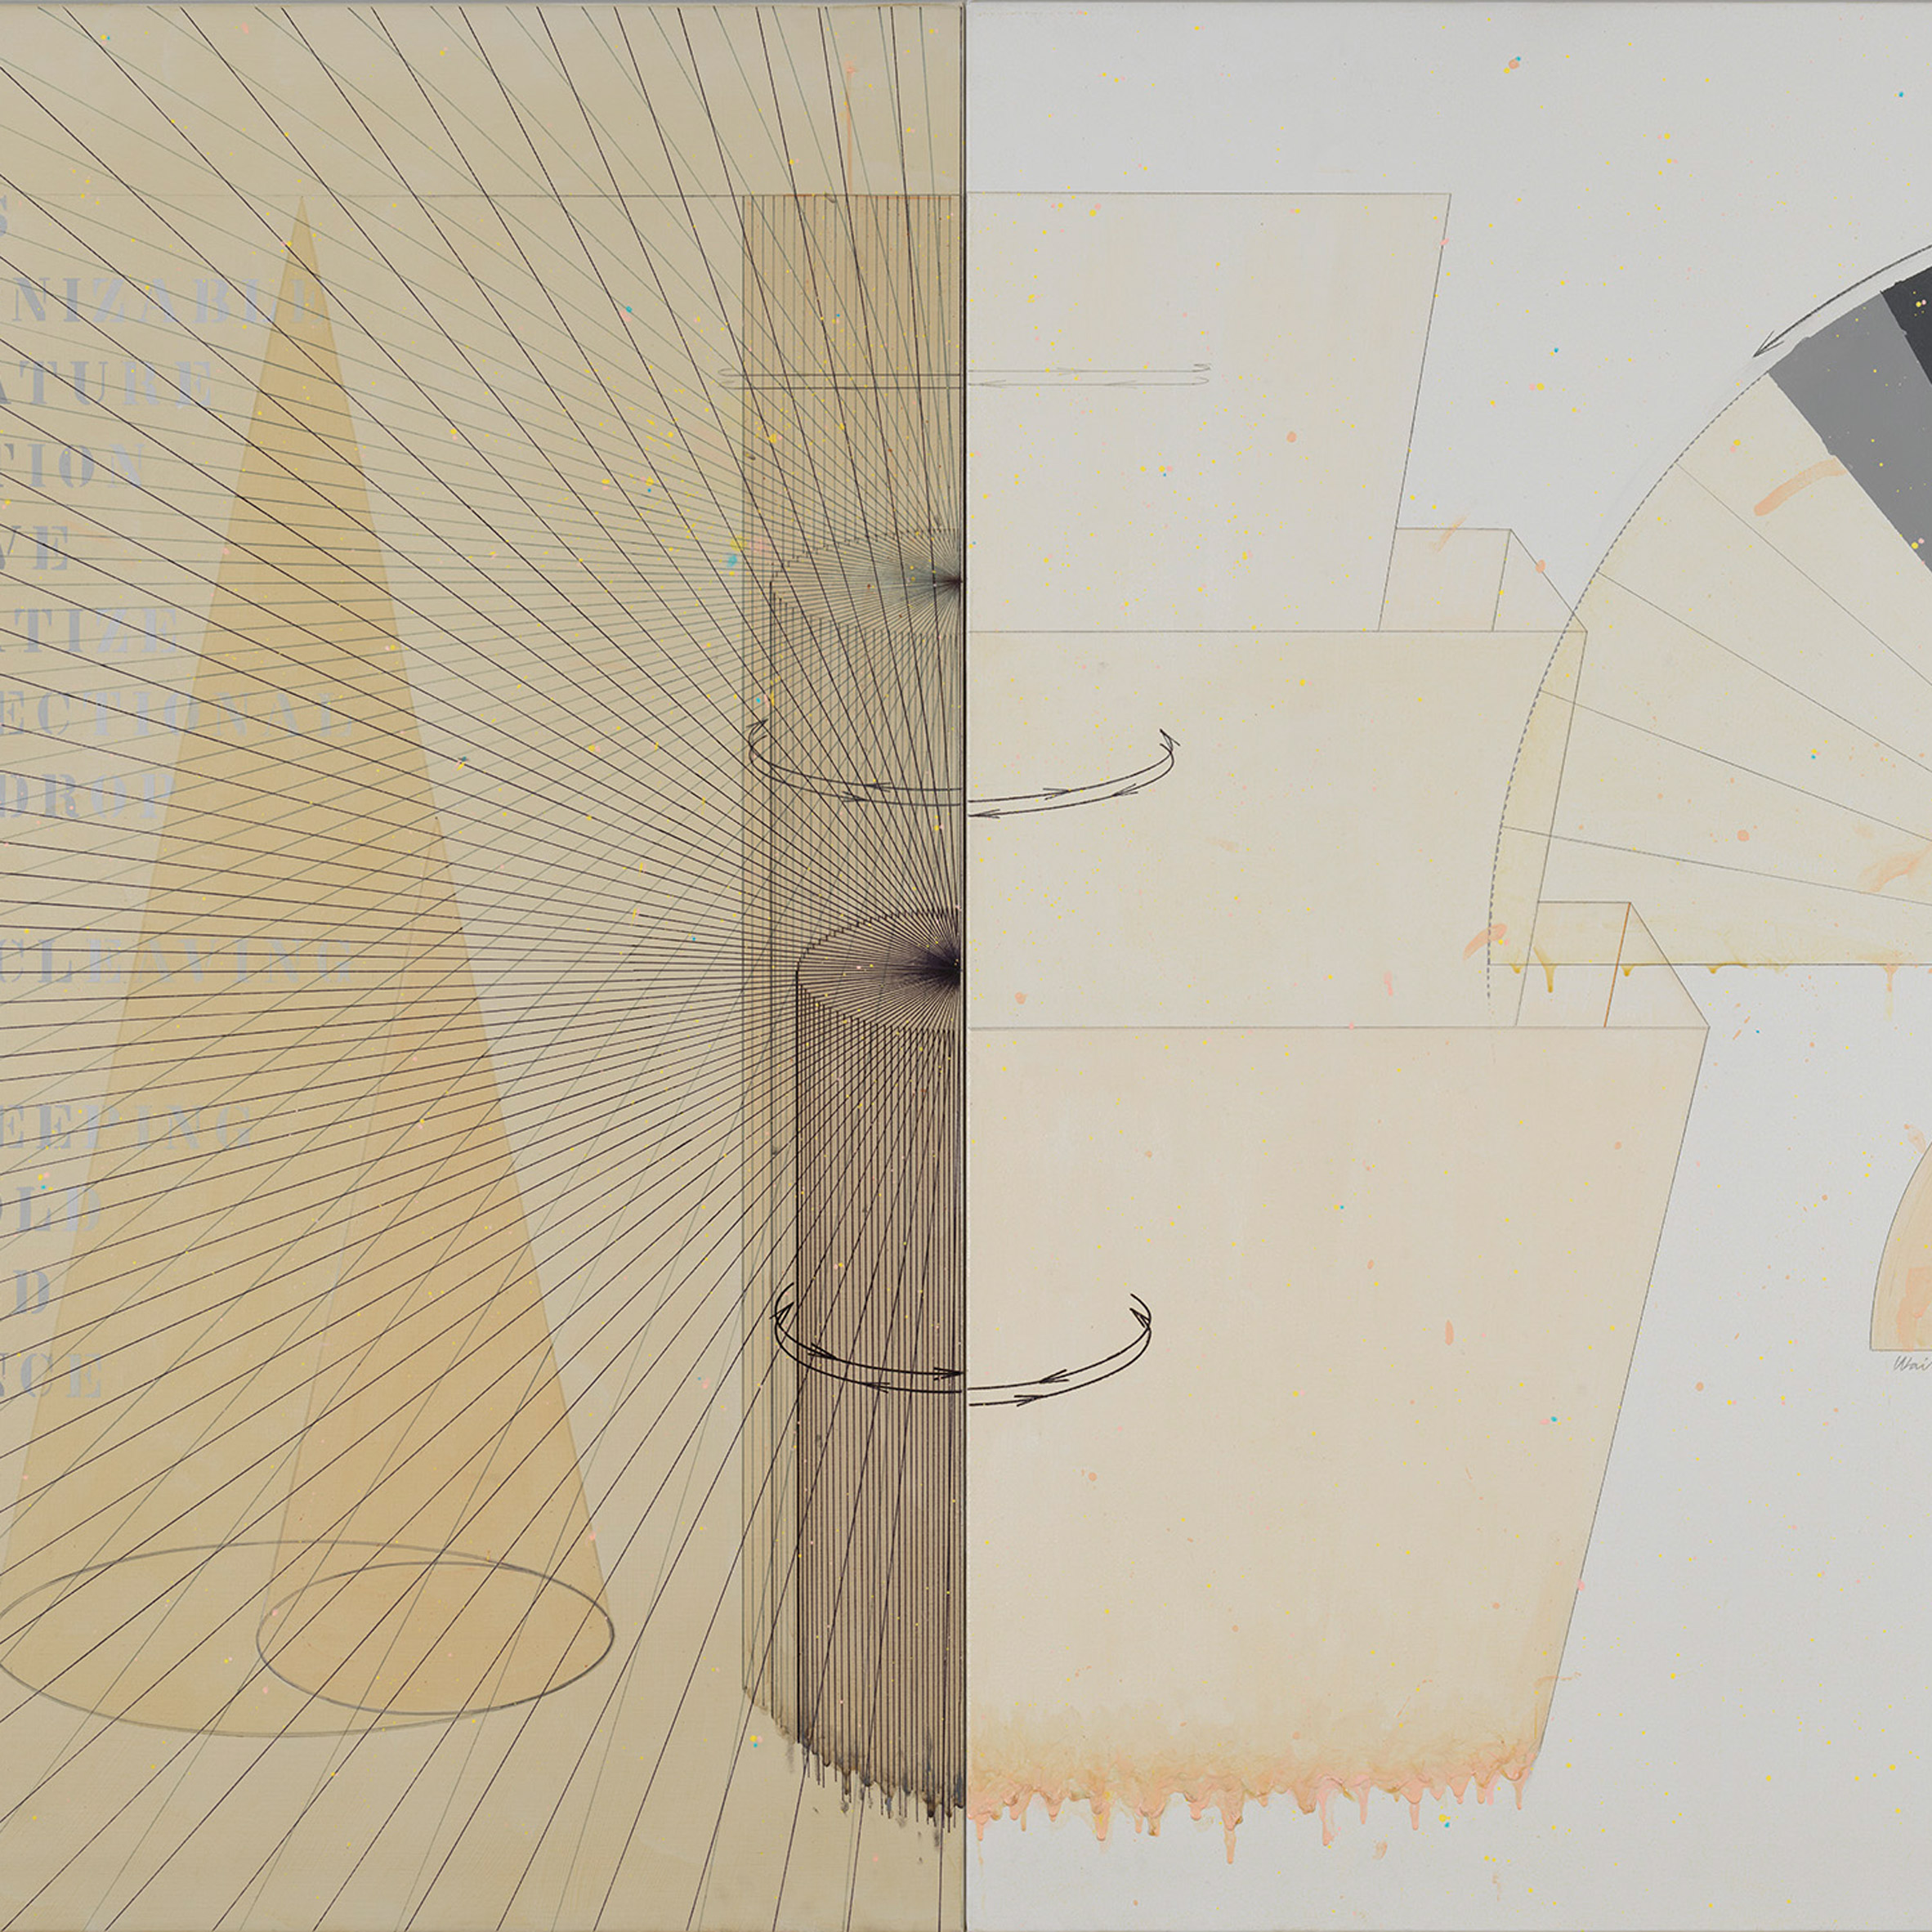 Diagrammatic Paintings By Shusaku Arakawa Go On Show In New York Already found the solution for dadaist jean? dezeen